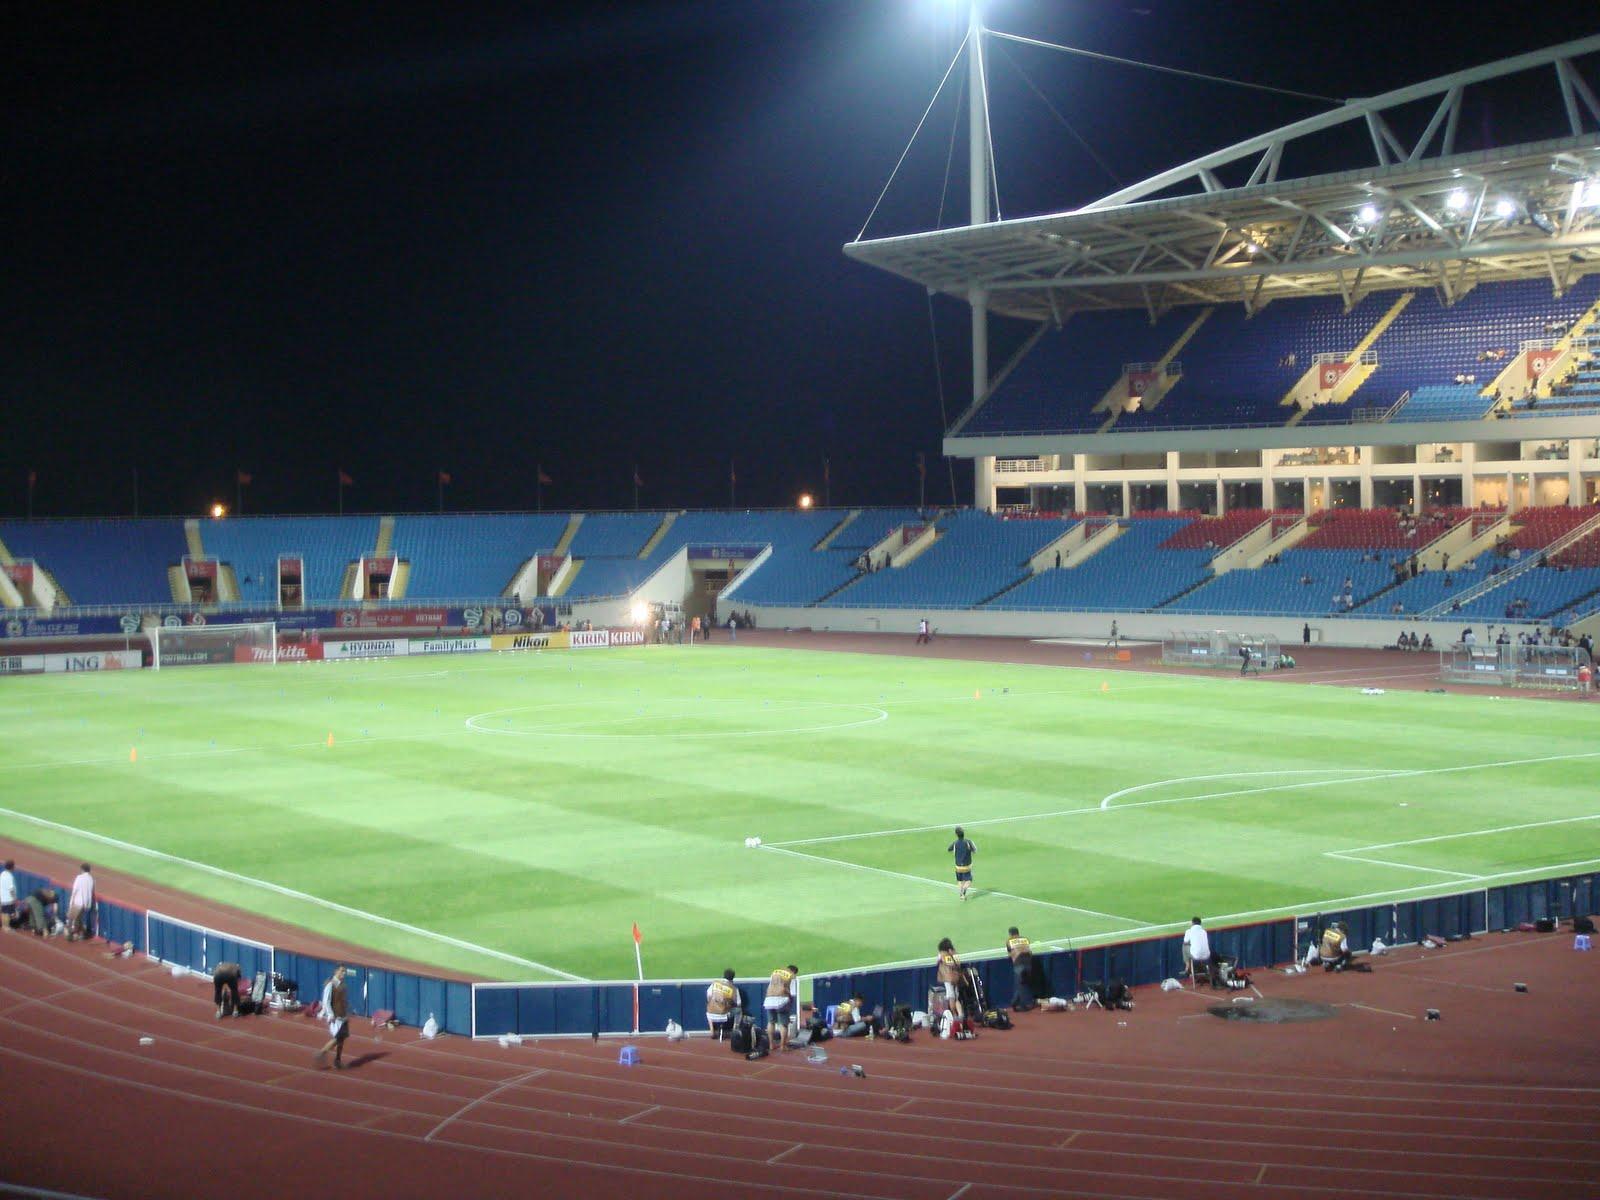 http://3.bp.blogspot.com/_gJMCSTp8SGs/S6rI29F3maI/AAAAAAAAC5s/yvABl3sqO0s/s1600/Vietnam_My_dinh-Stadium.jpg